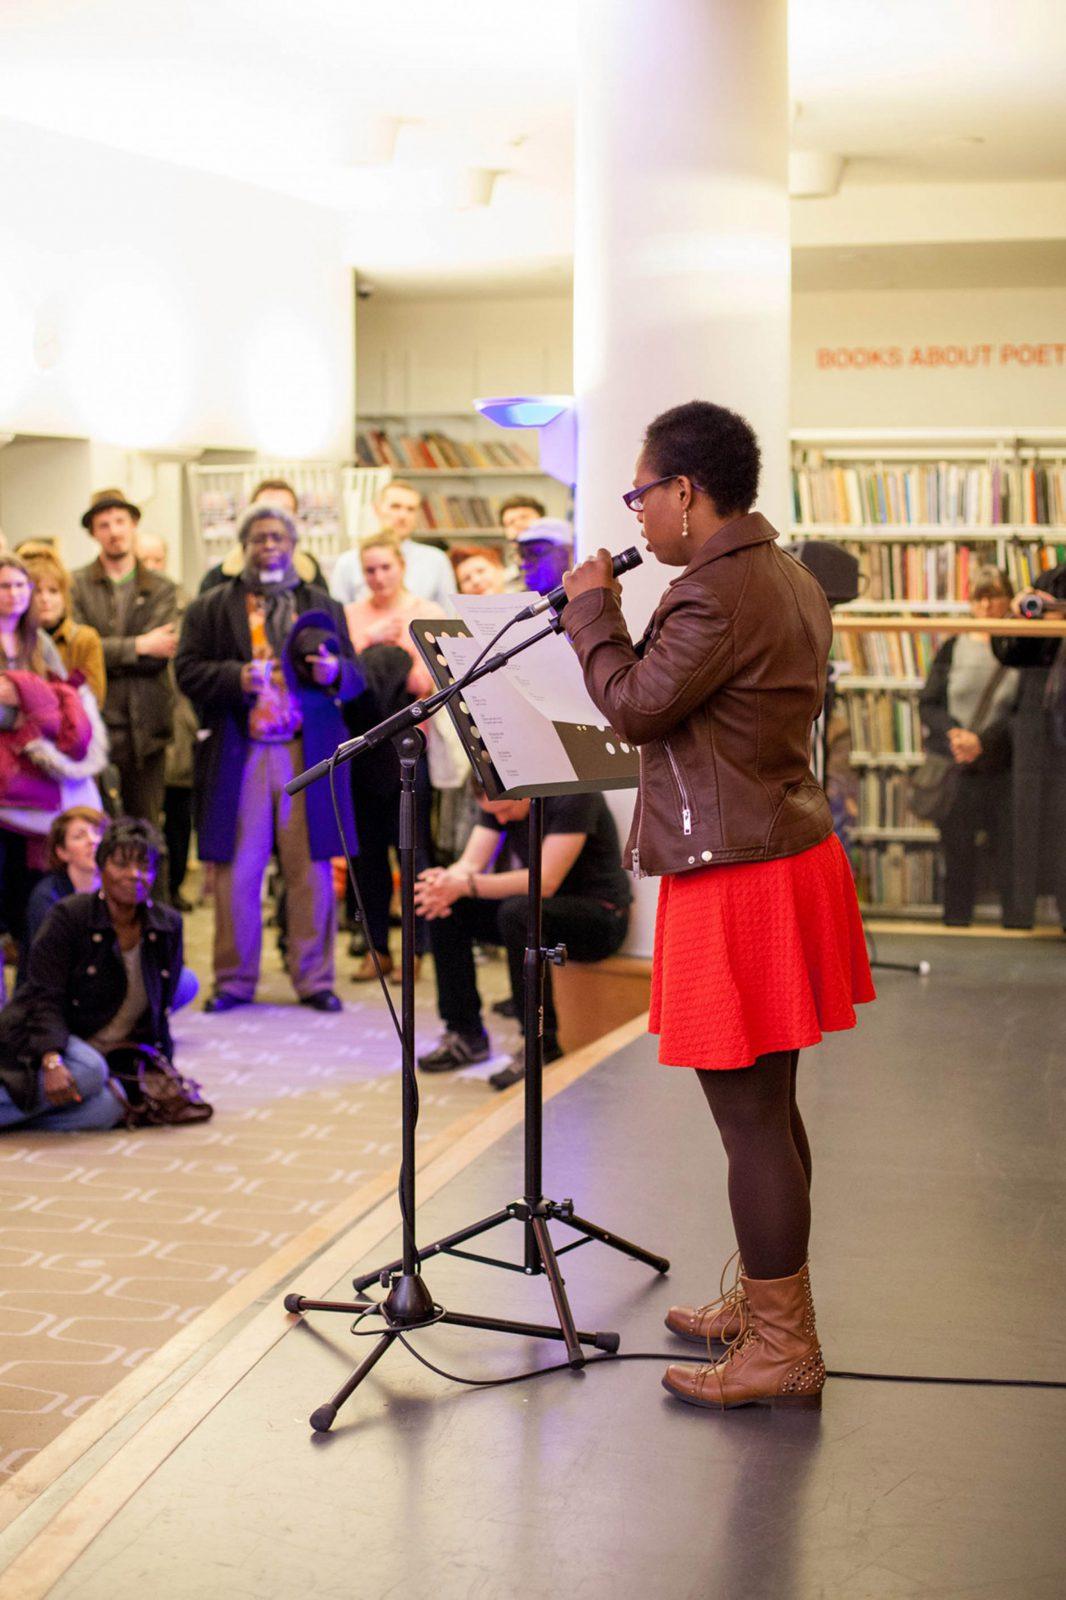 Ntiense Eno Amooquaye, public performance